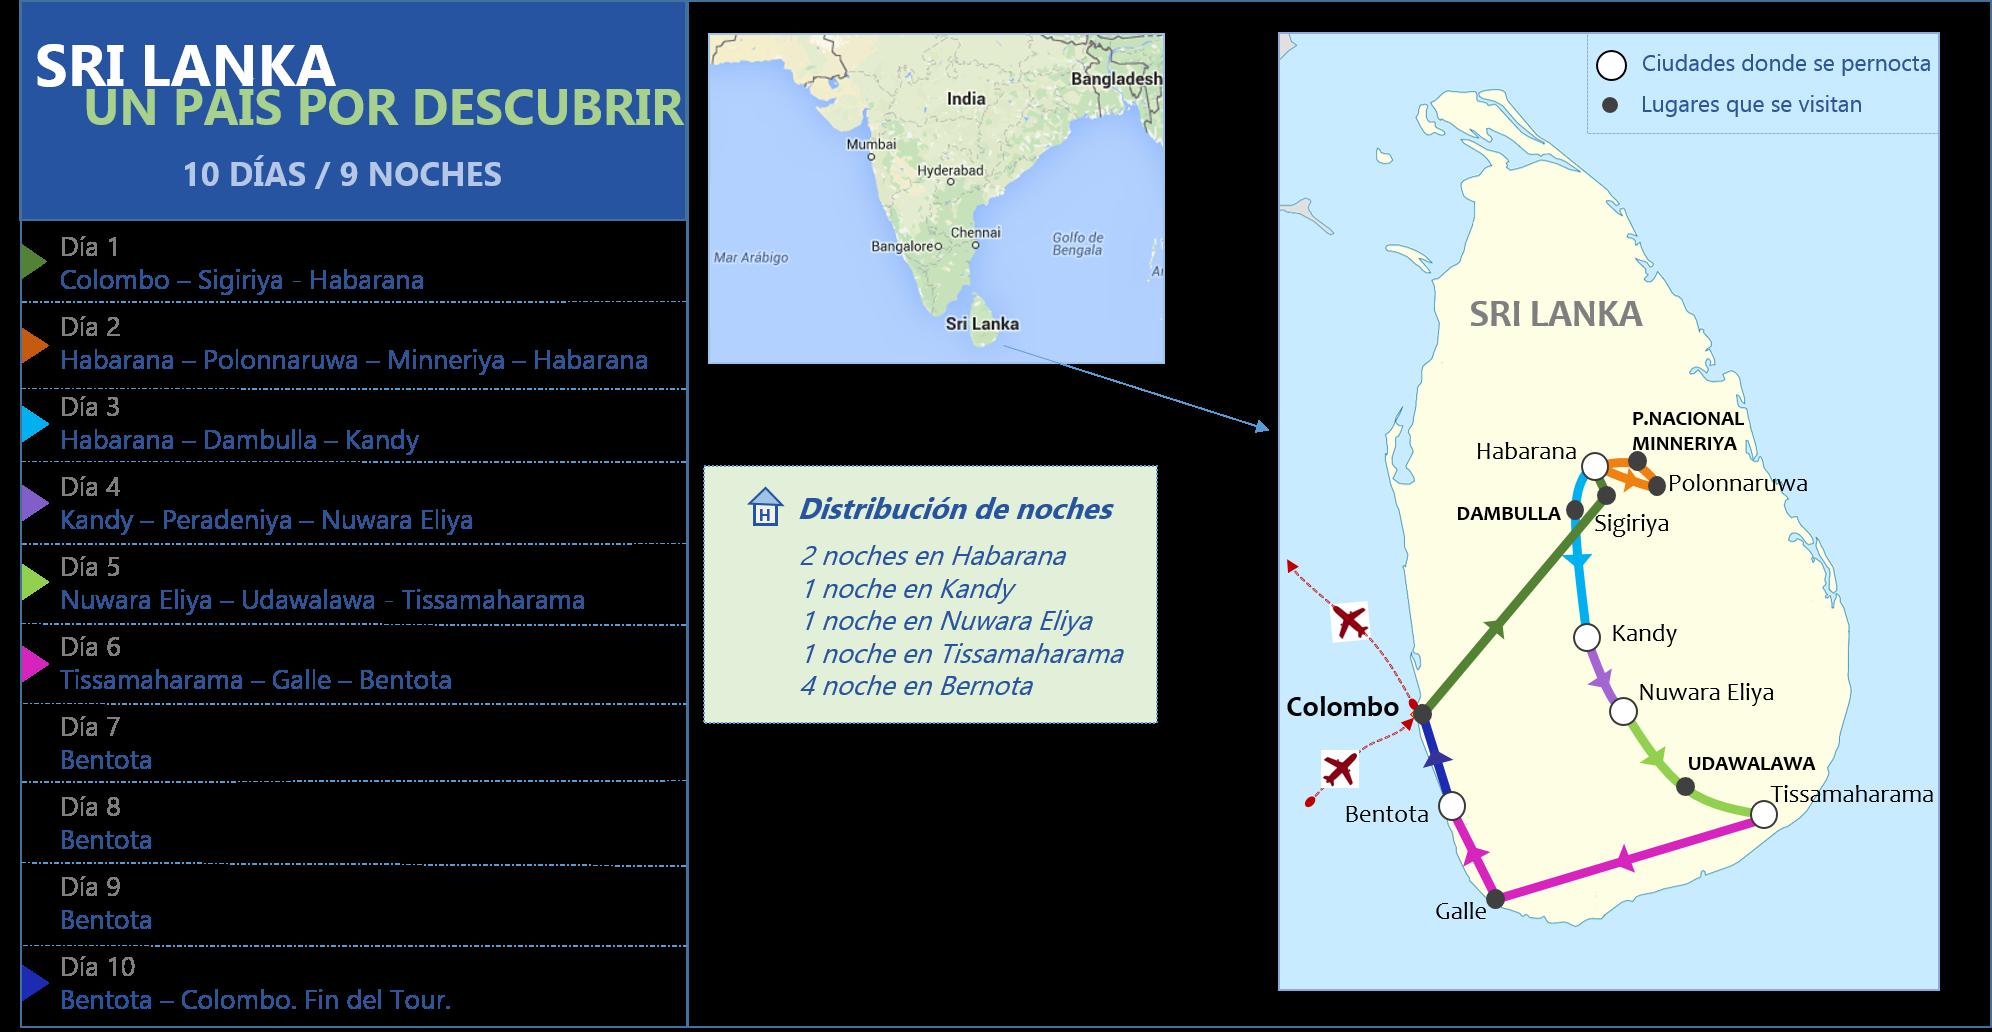 Sri Lanka Un País por descubrir 10d - 9n